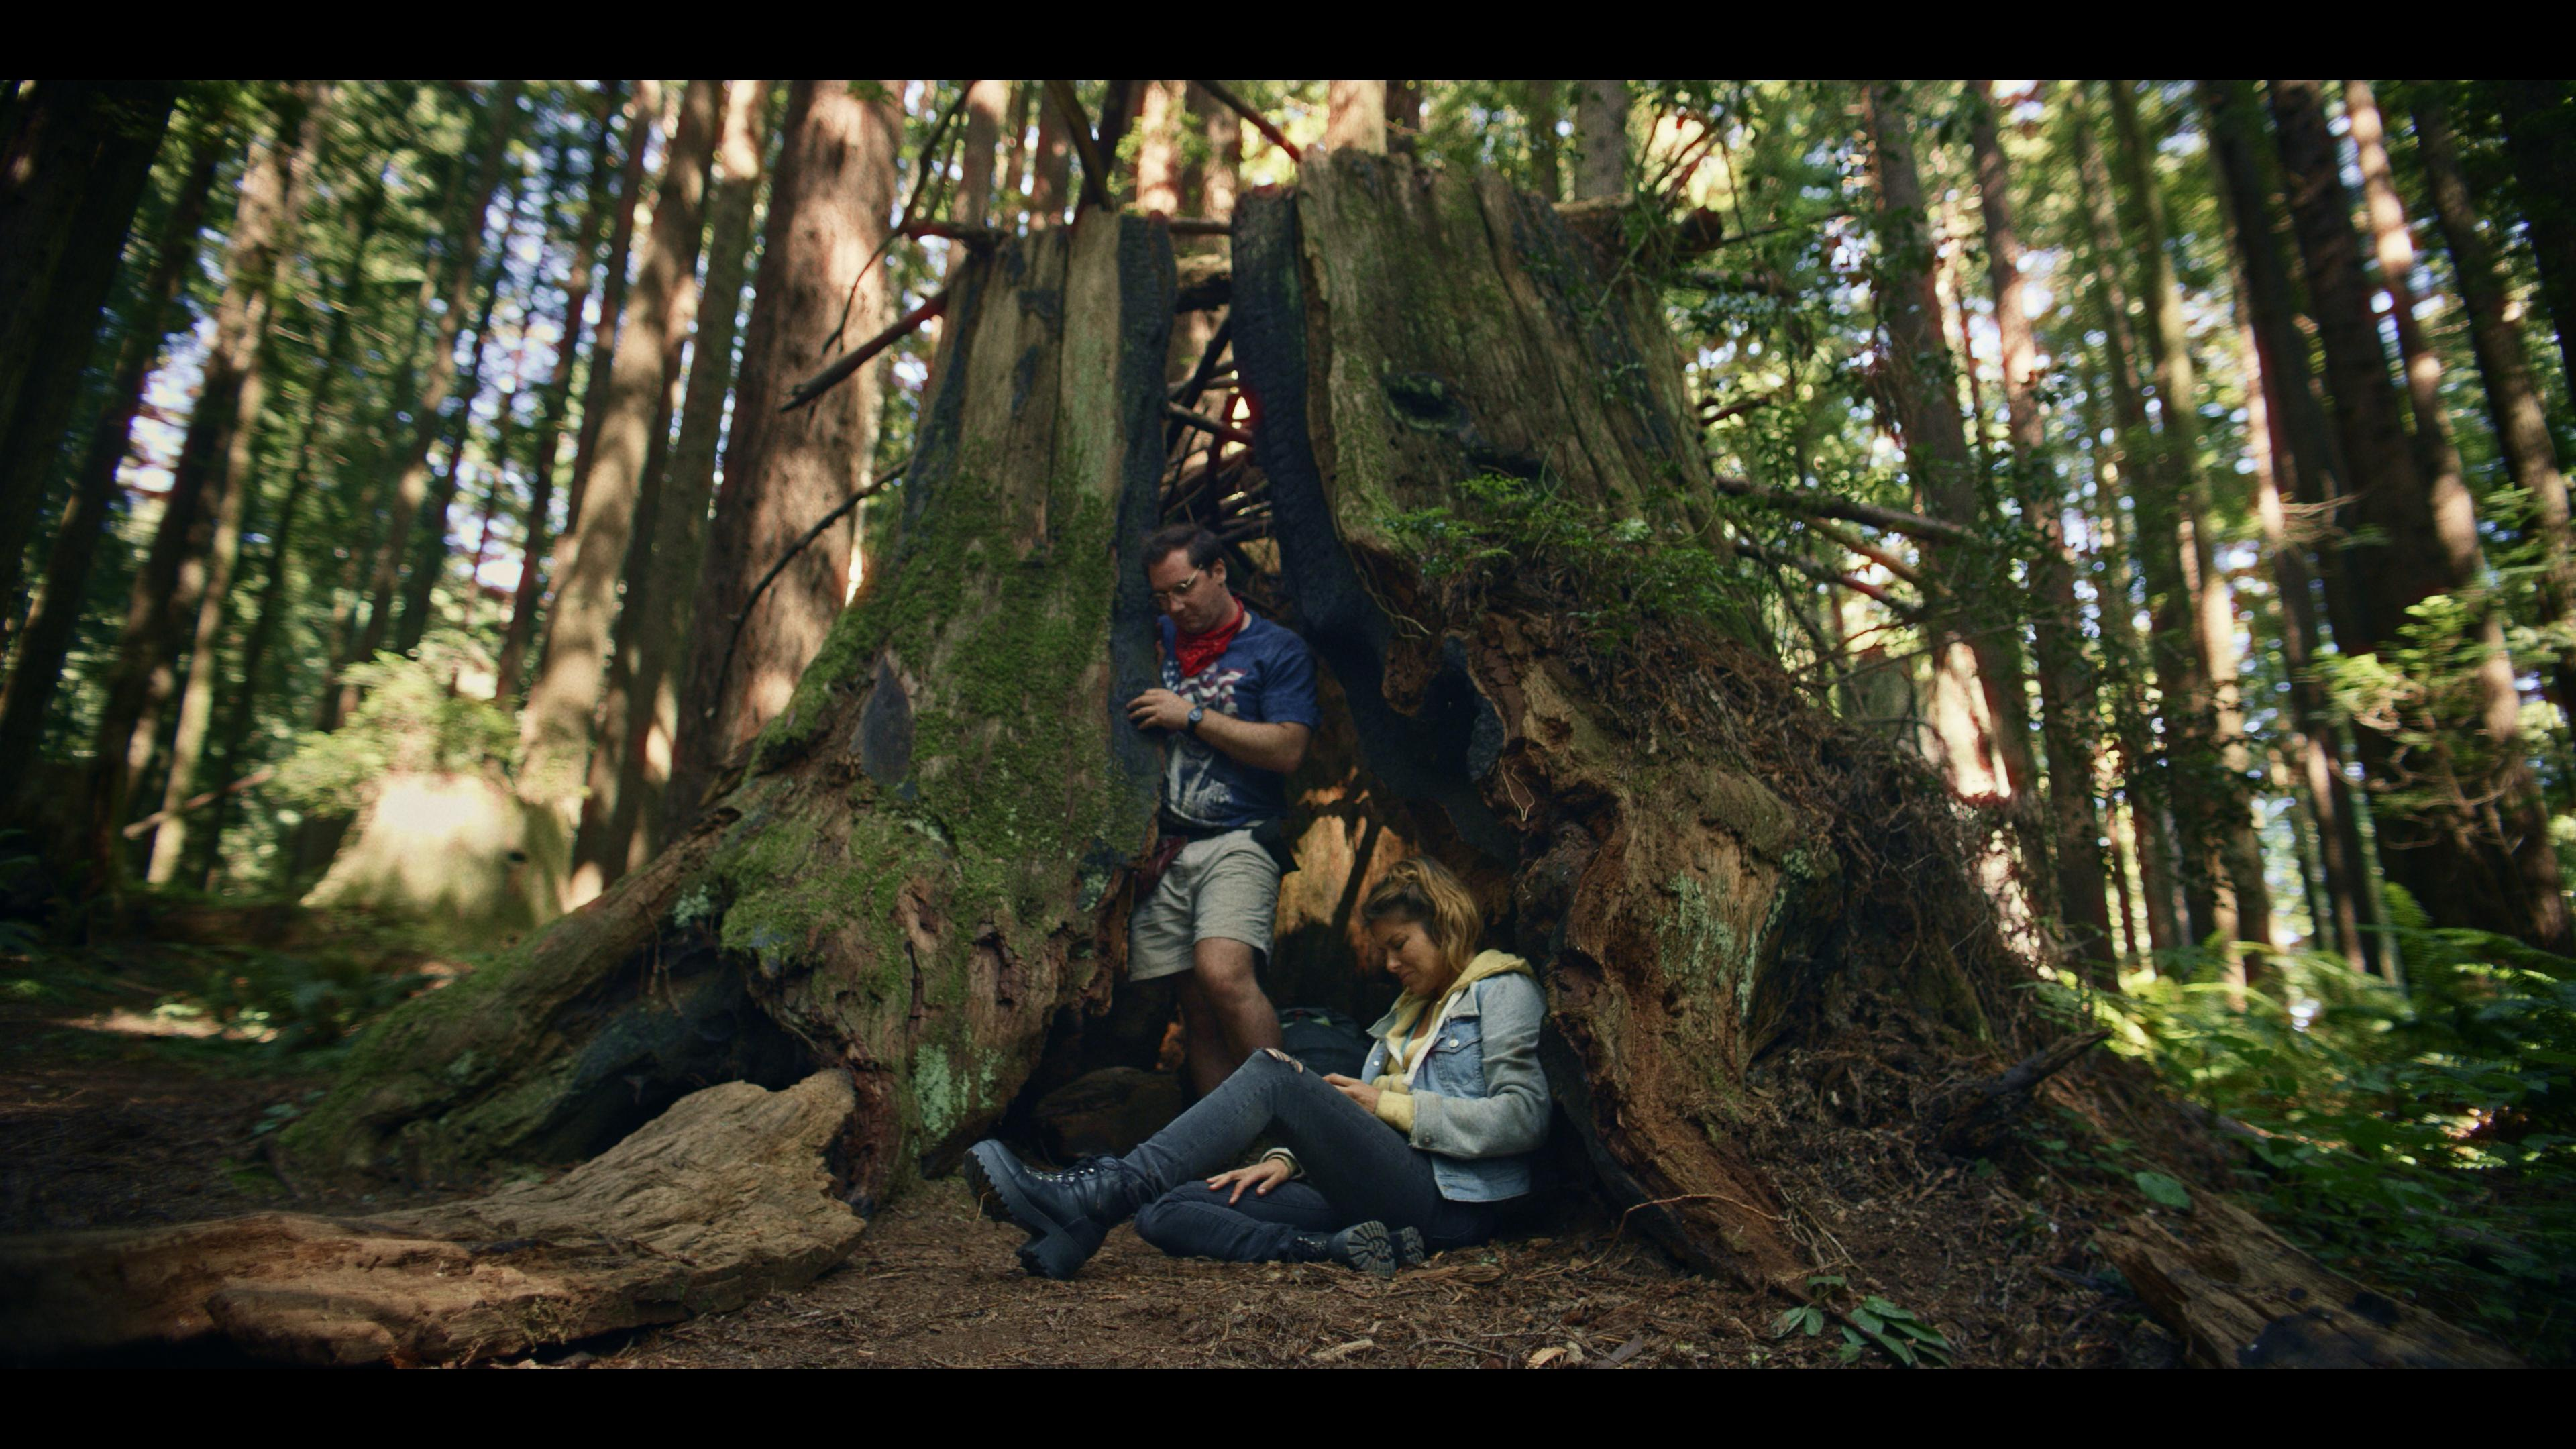 bigfoot-famous-tree